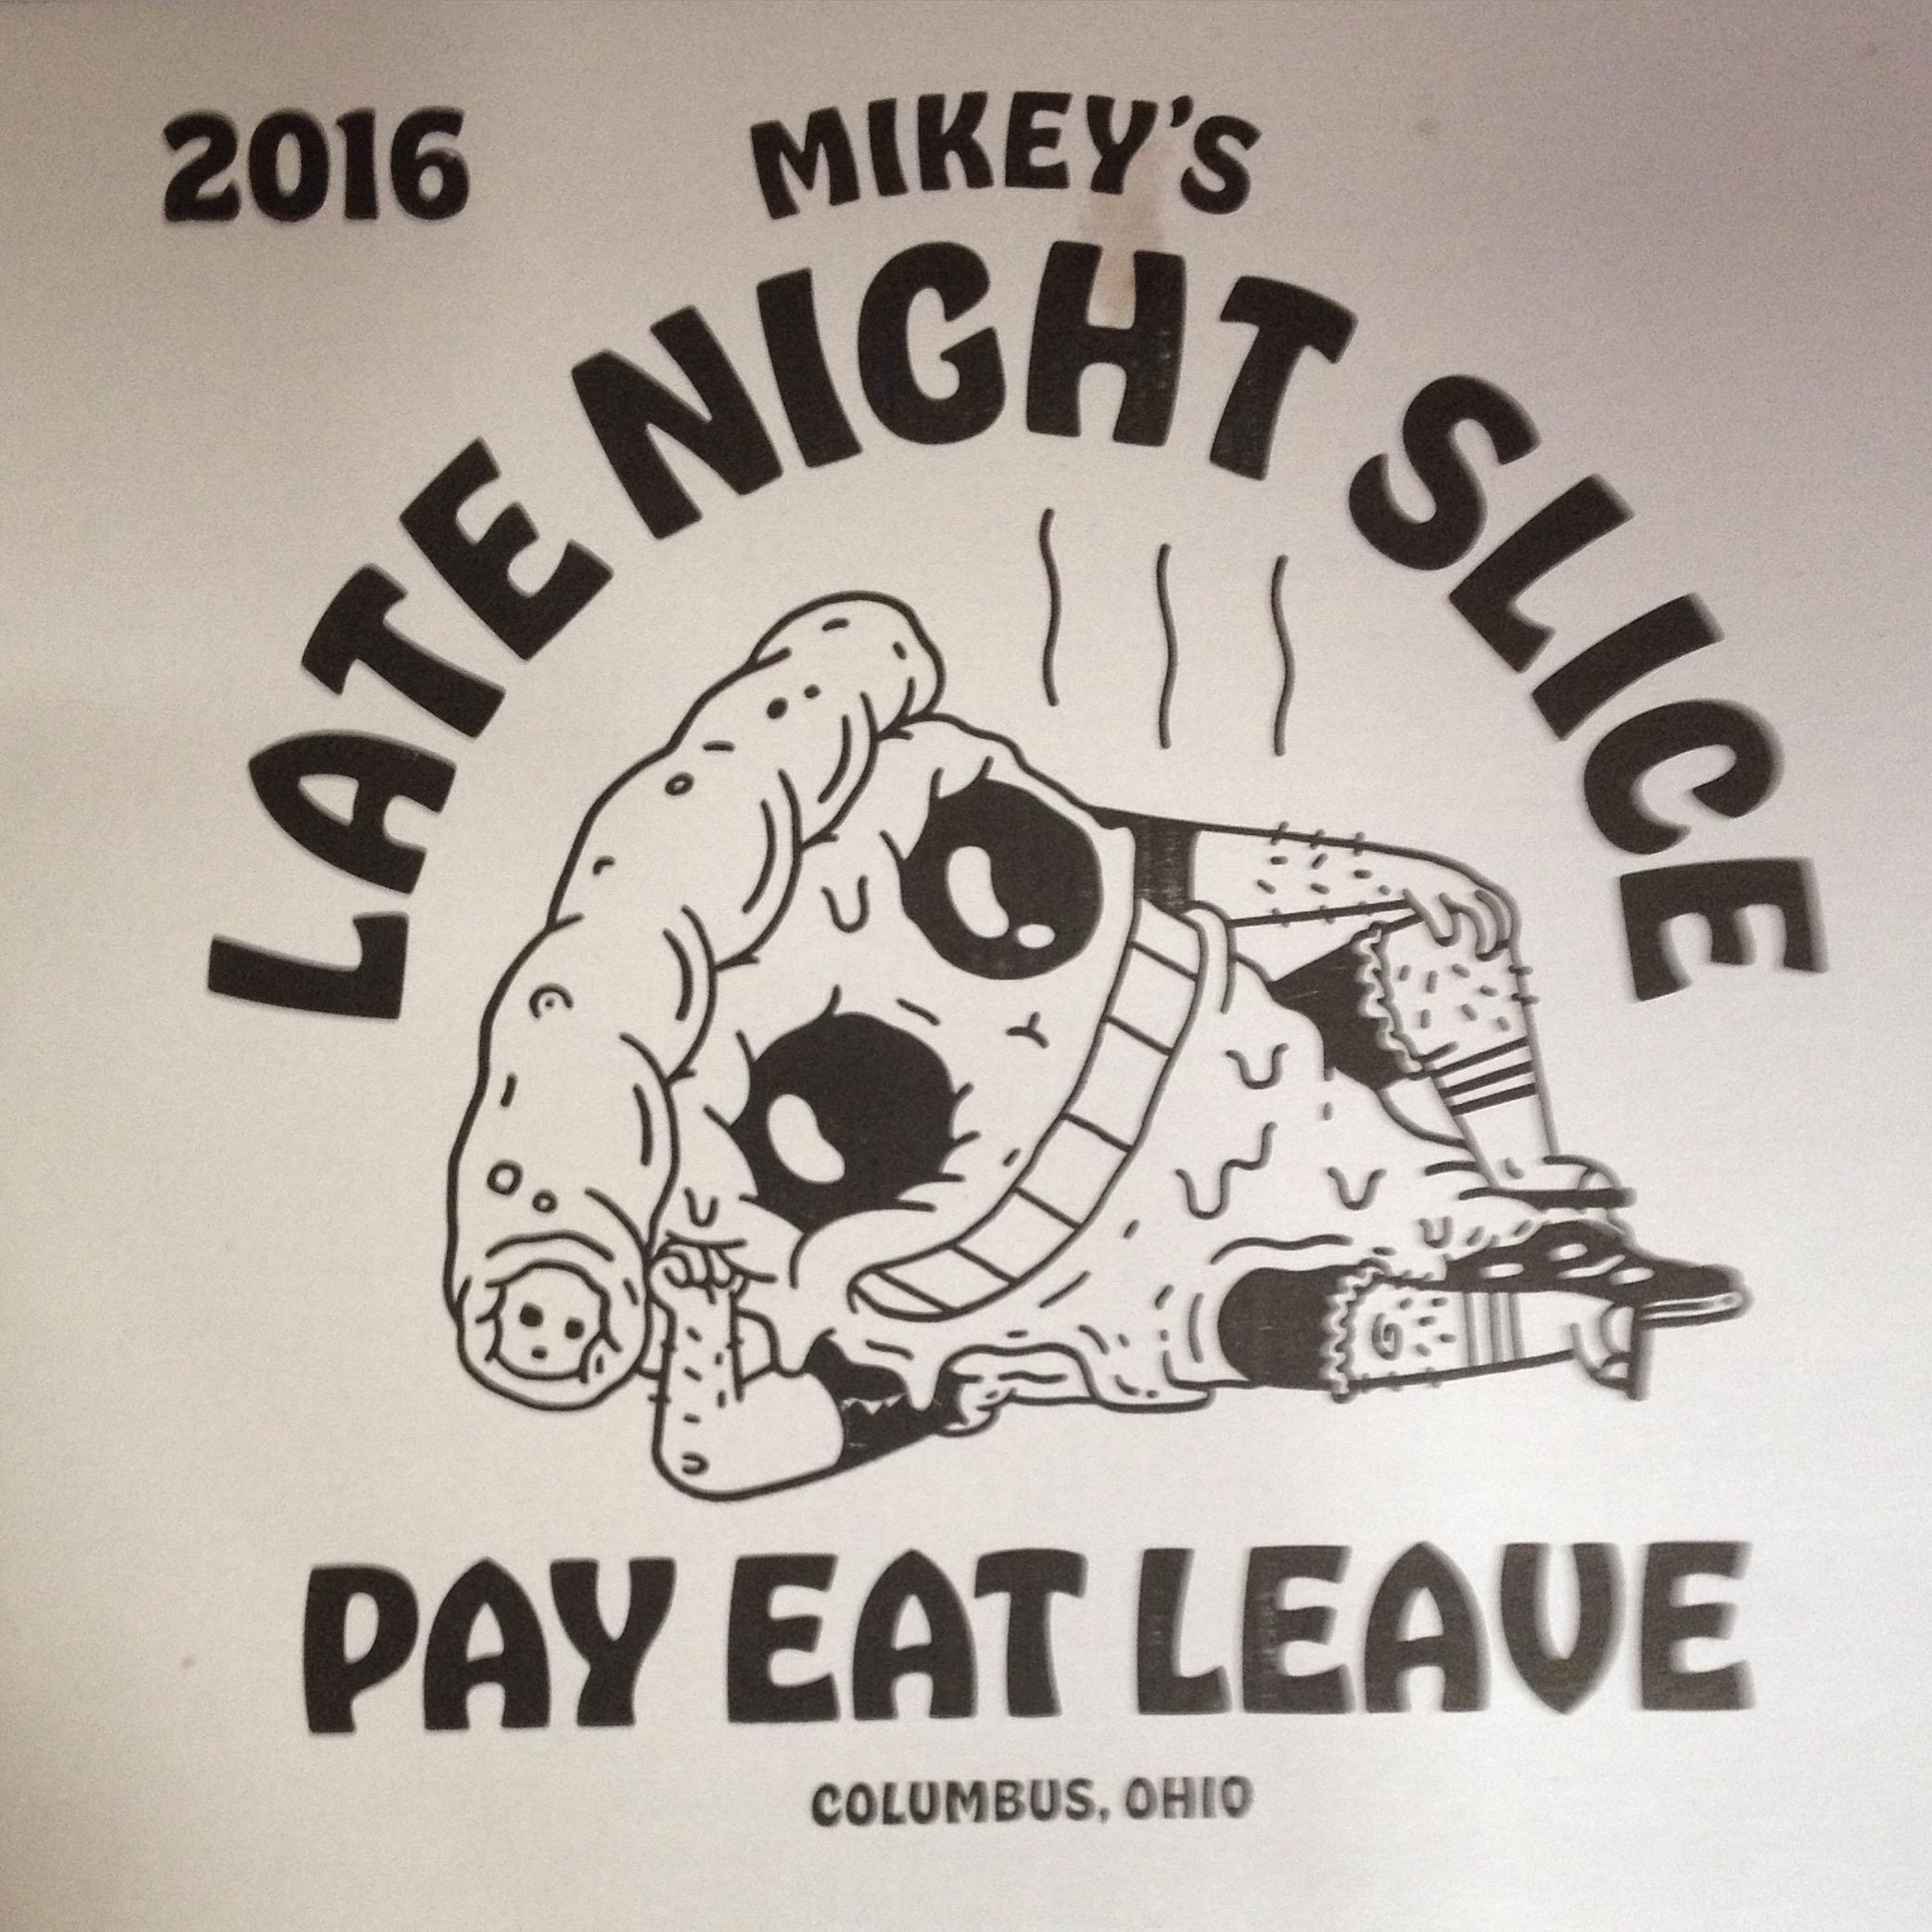 Late Night Slice box